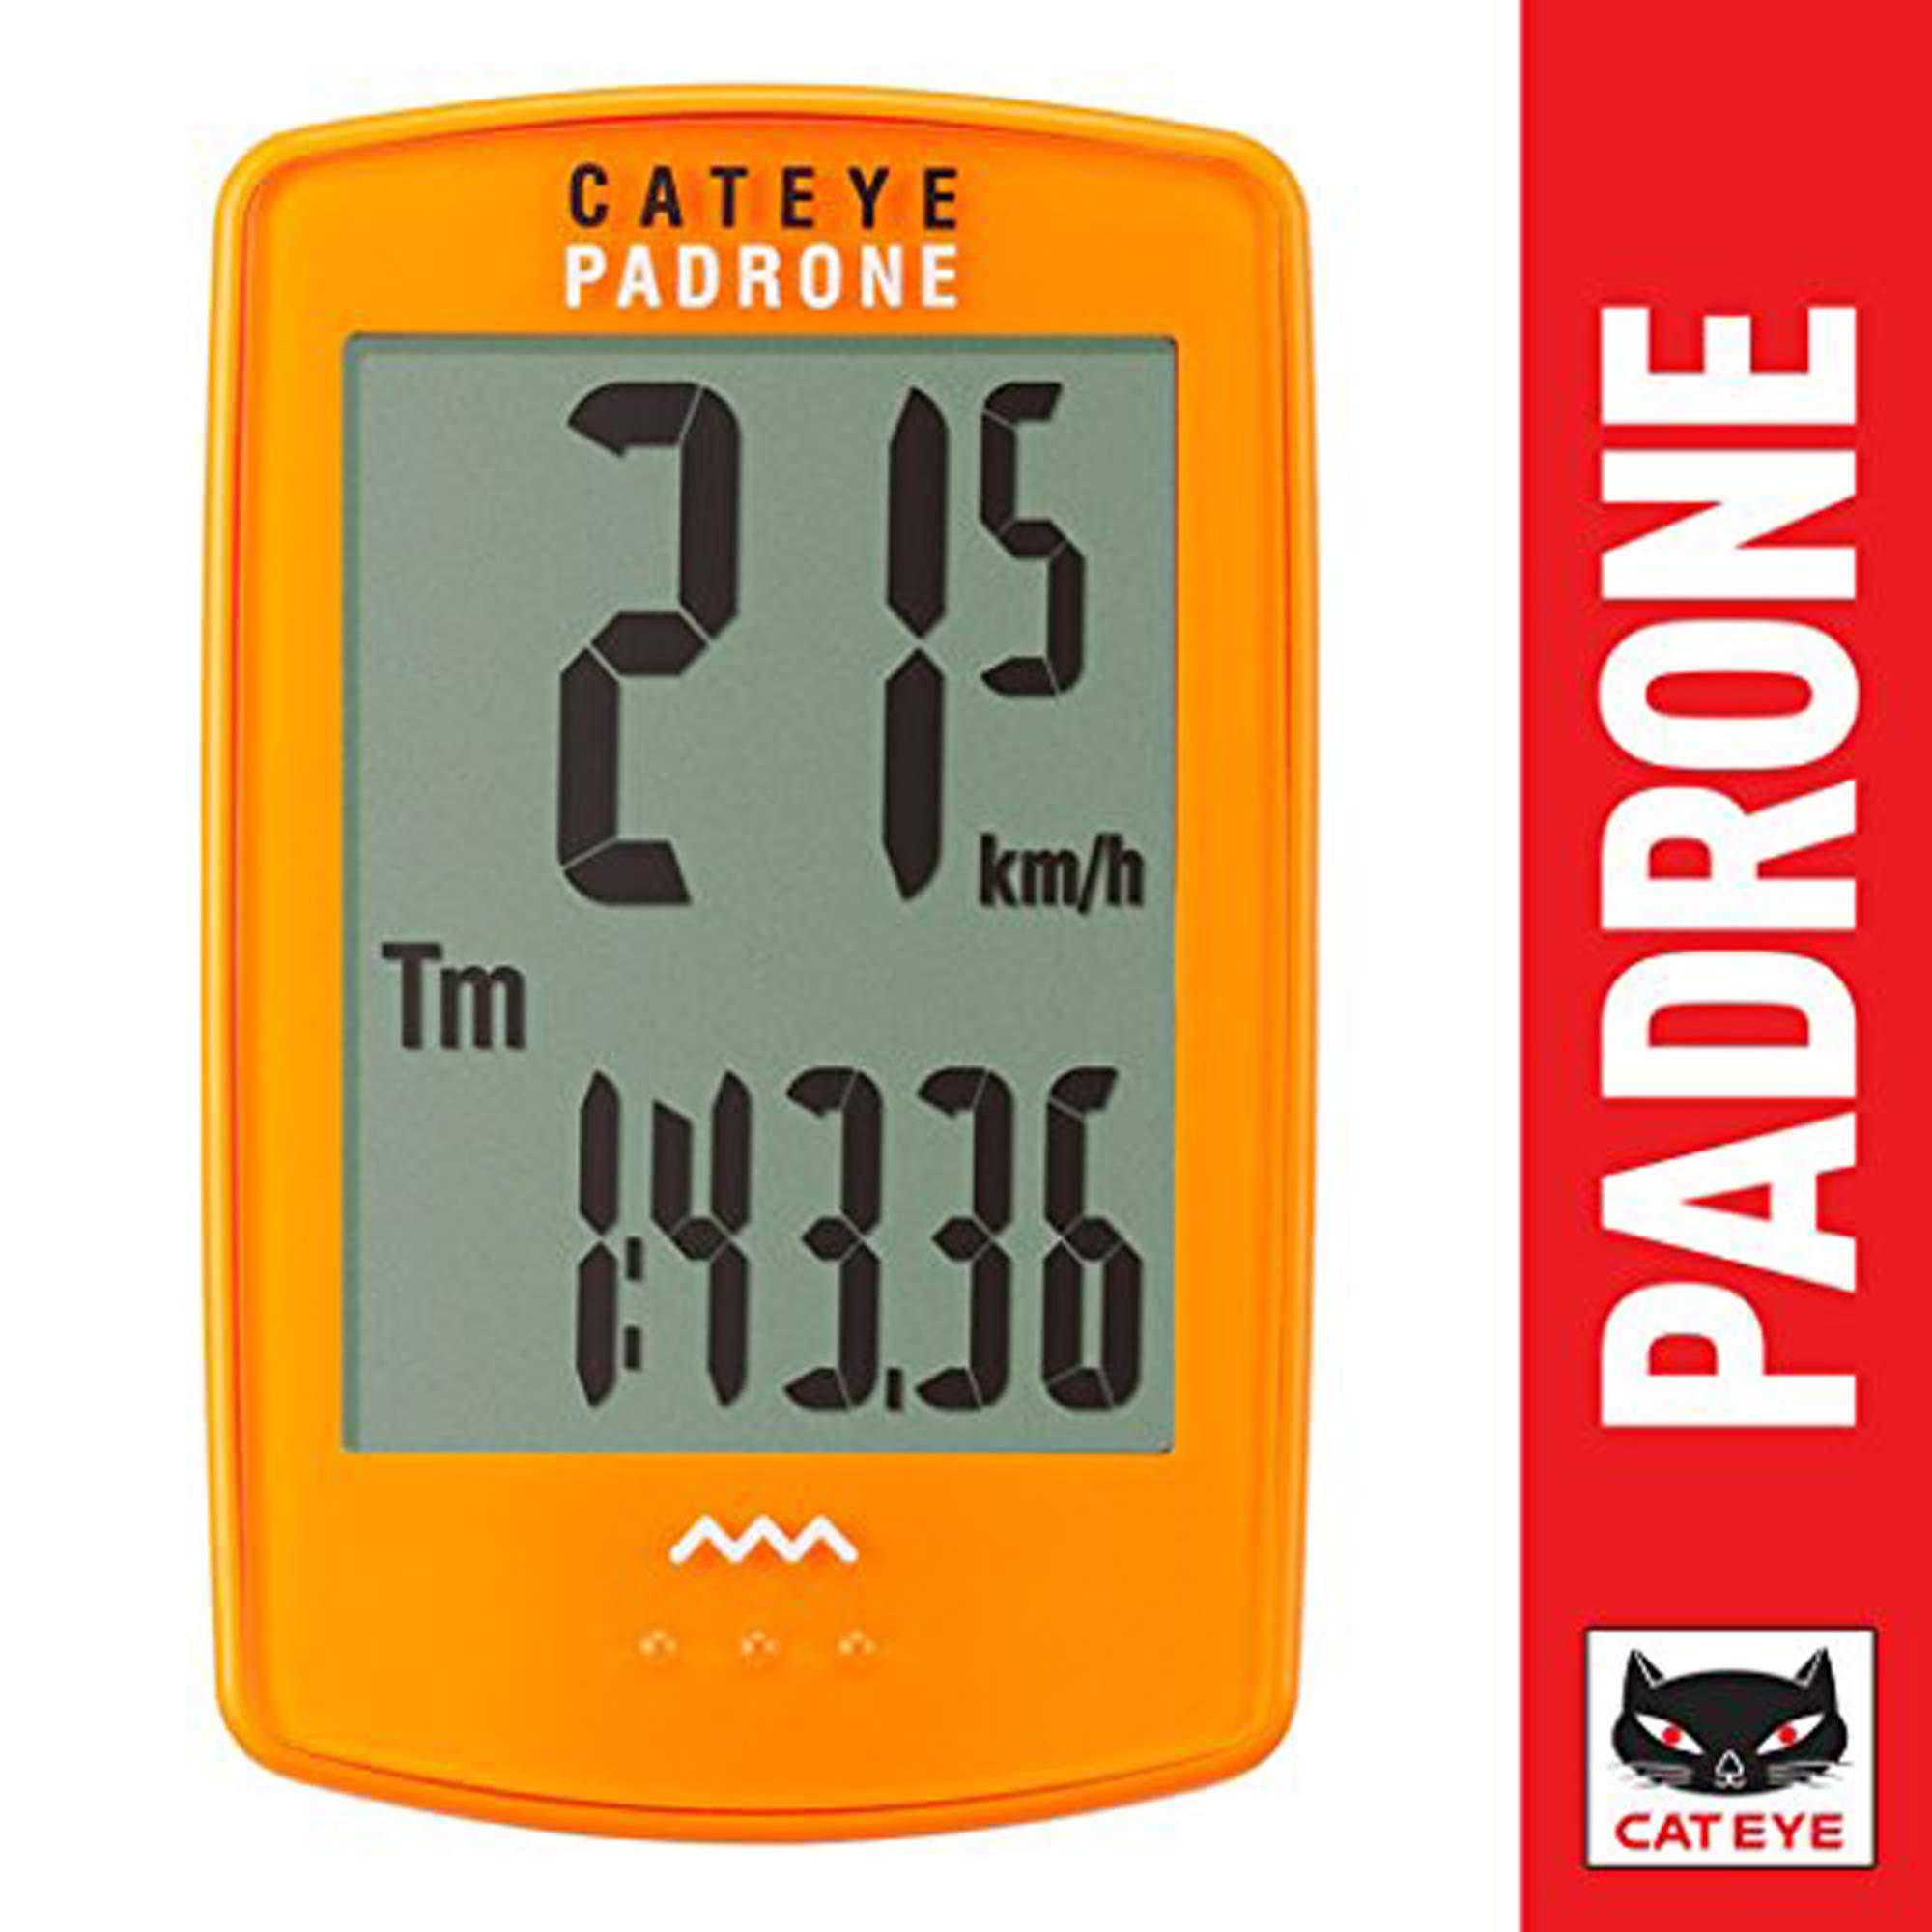 CAT EYE - Padrone Wireless Bike Computer, Orange